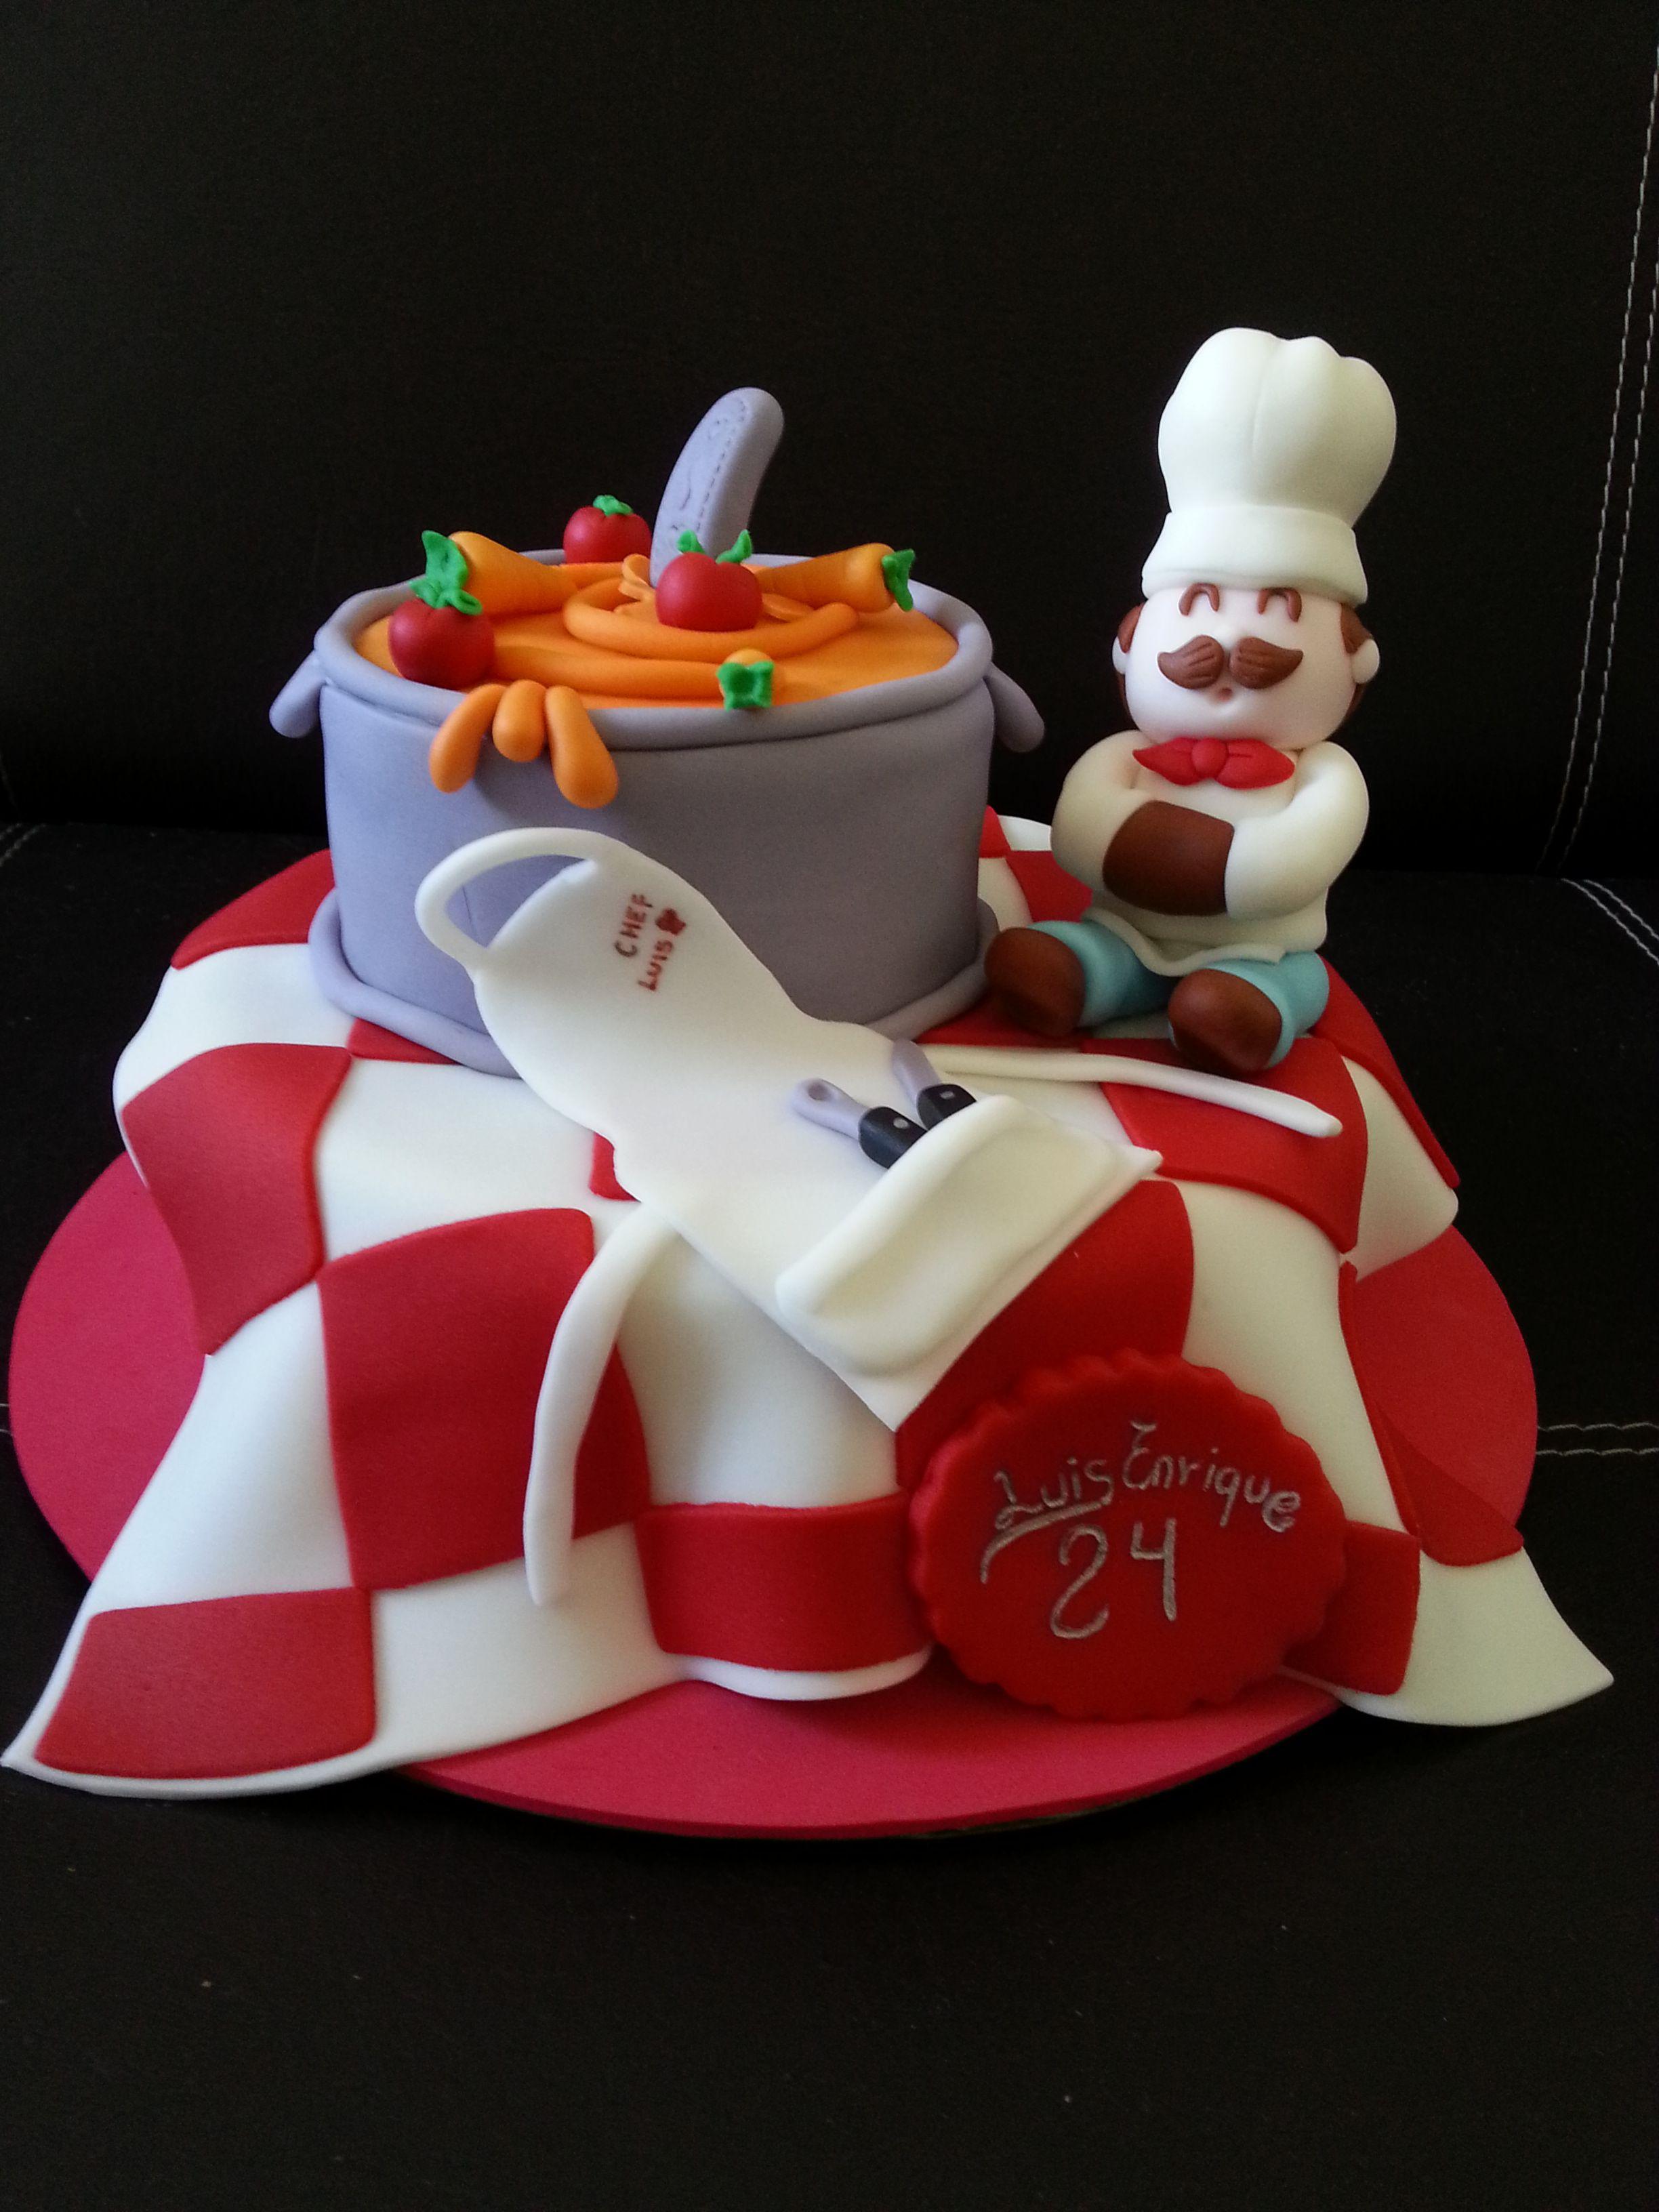 Chef Fondant Cake Cakes In 2019 Cake Chef Cake